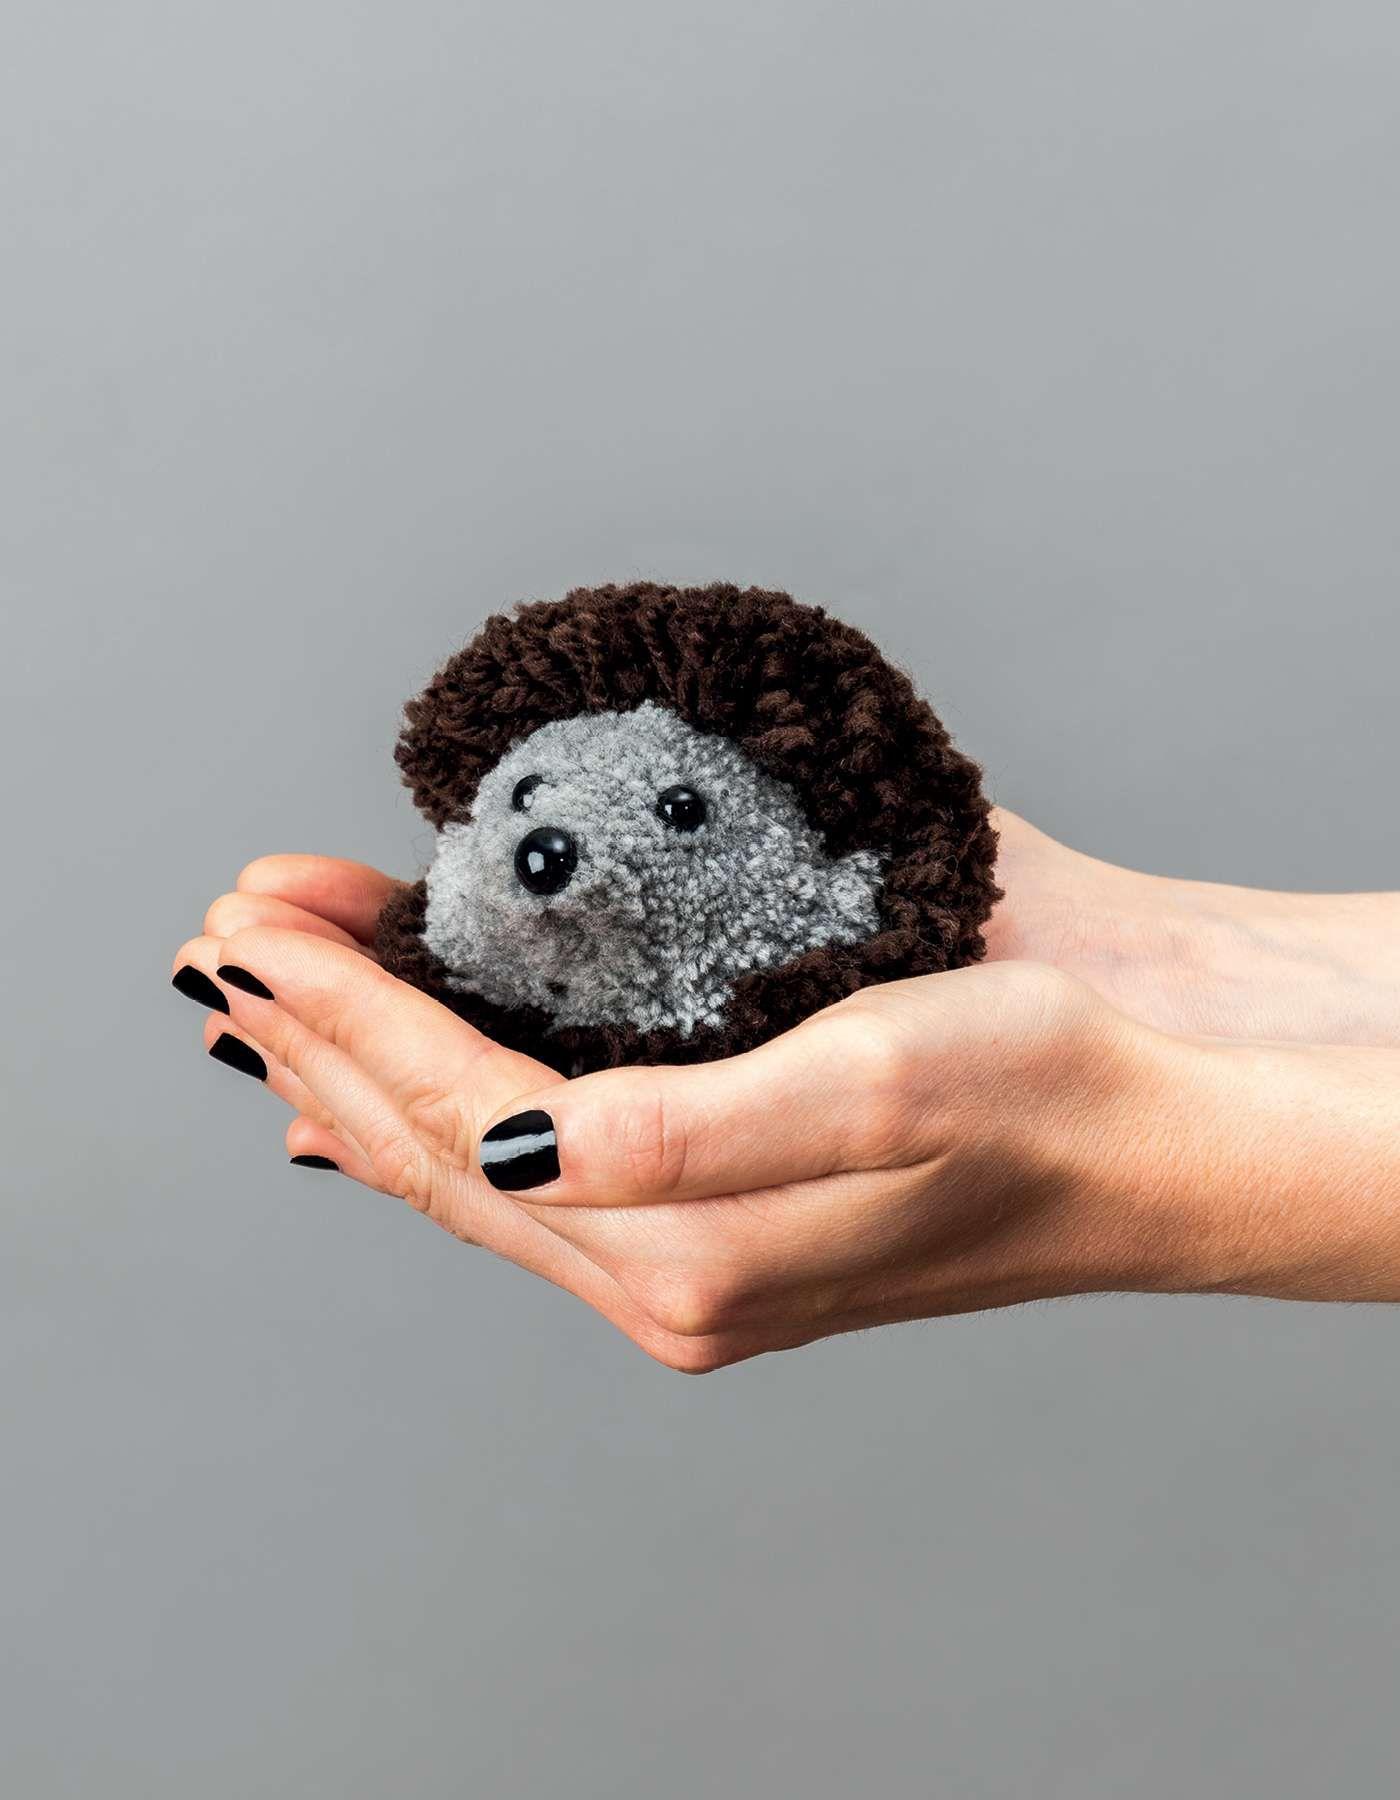 Anleitung Pompon Igel Basteln Basteln Mit Kindern Basteln